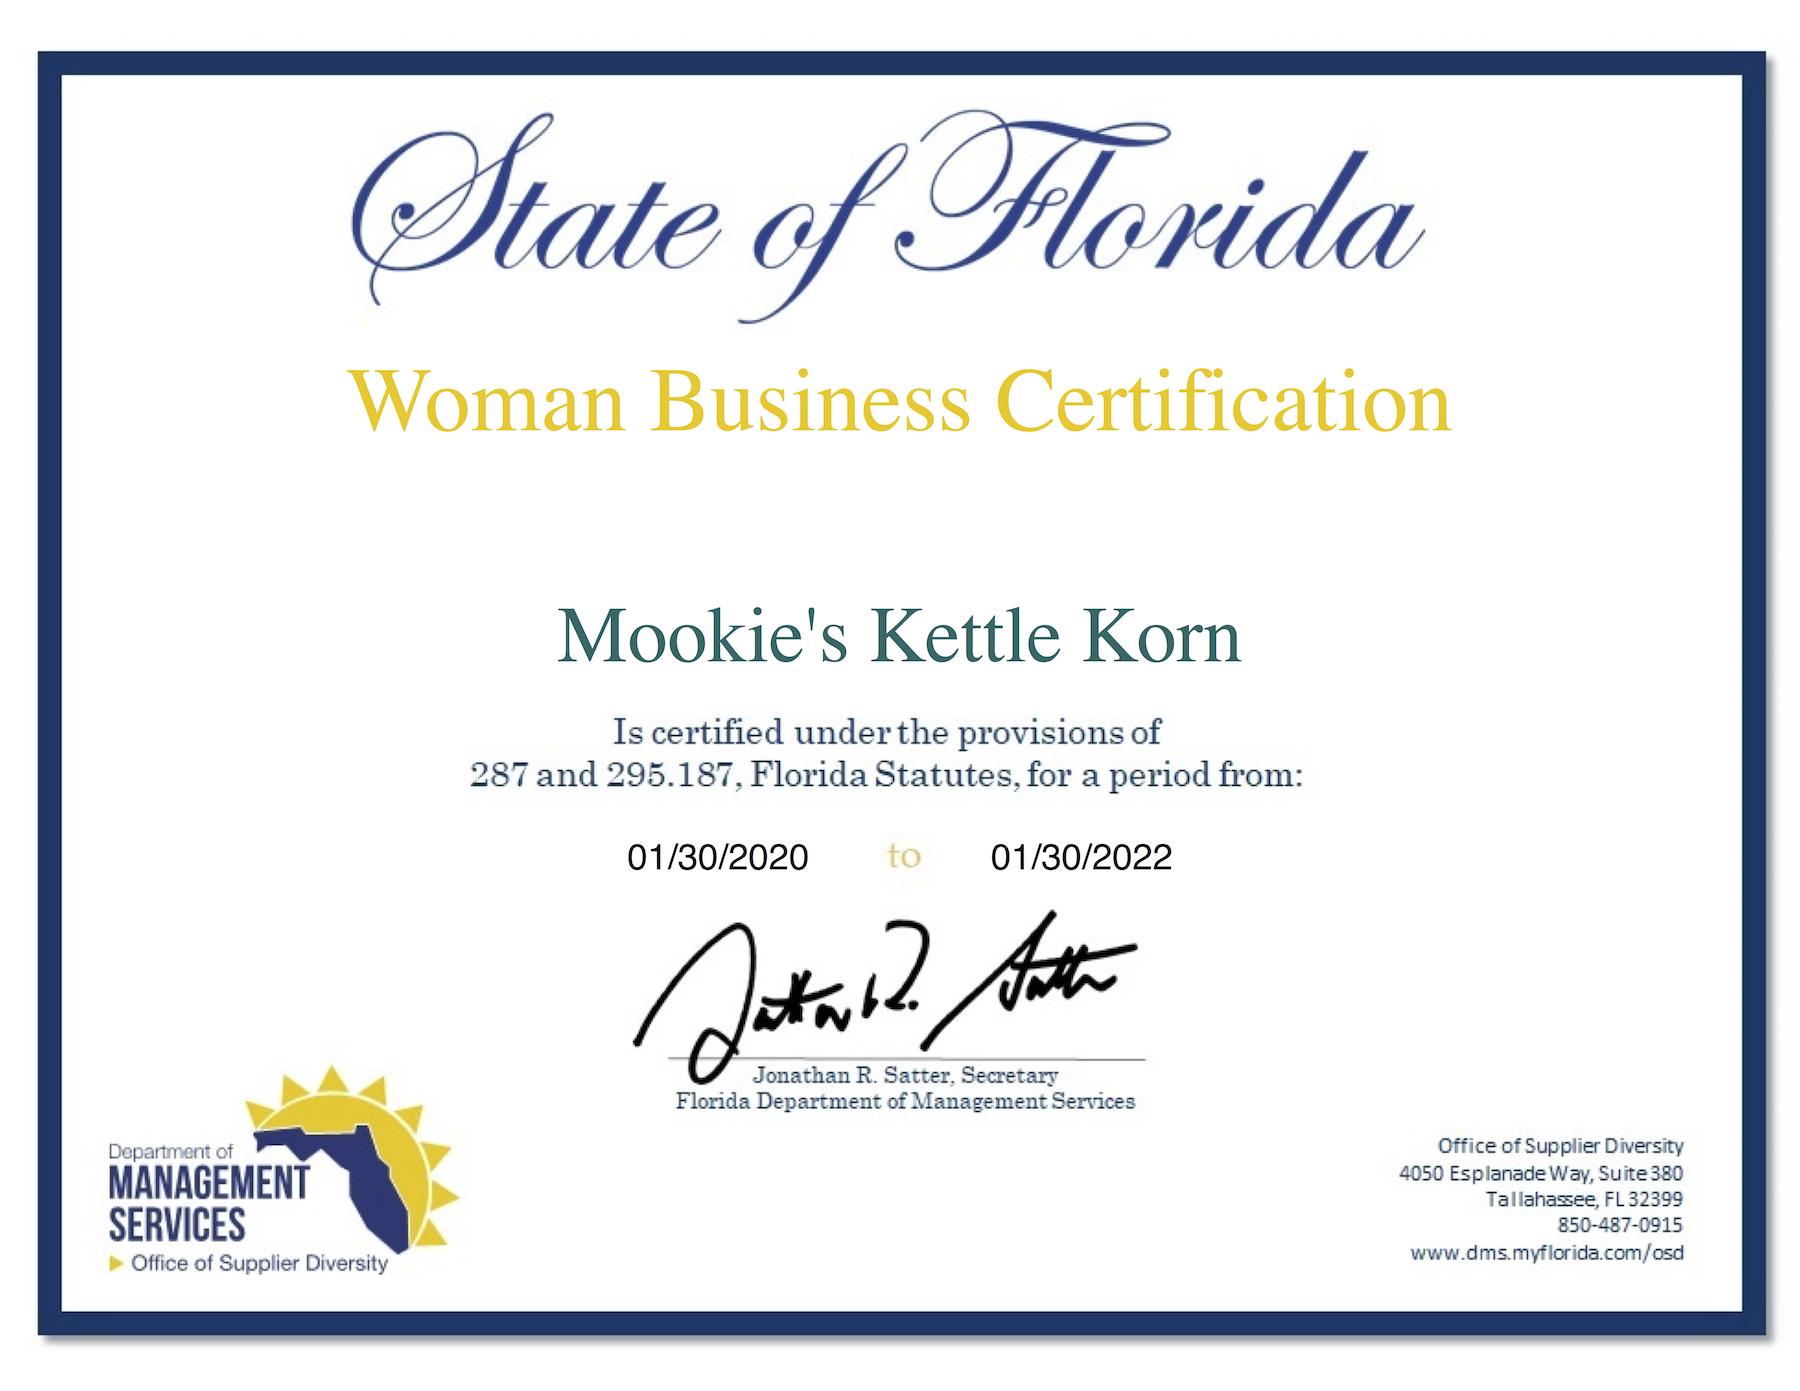 mbe certificate osd